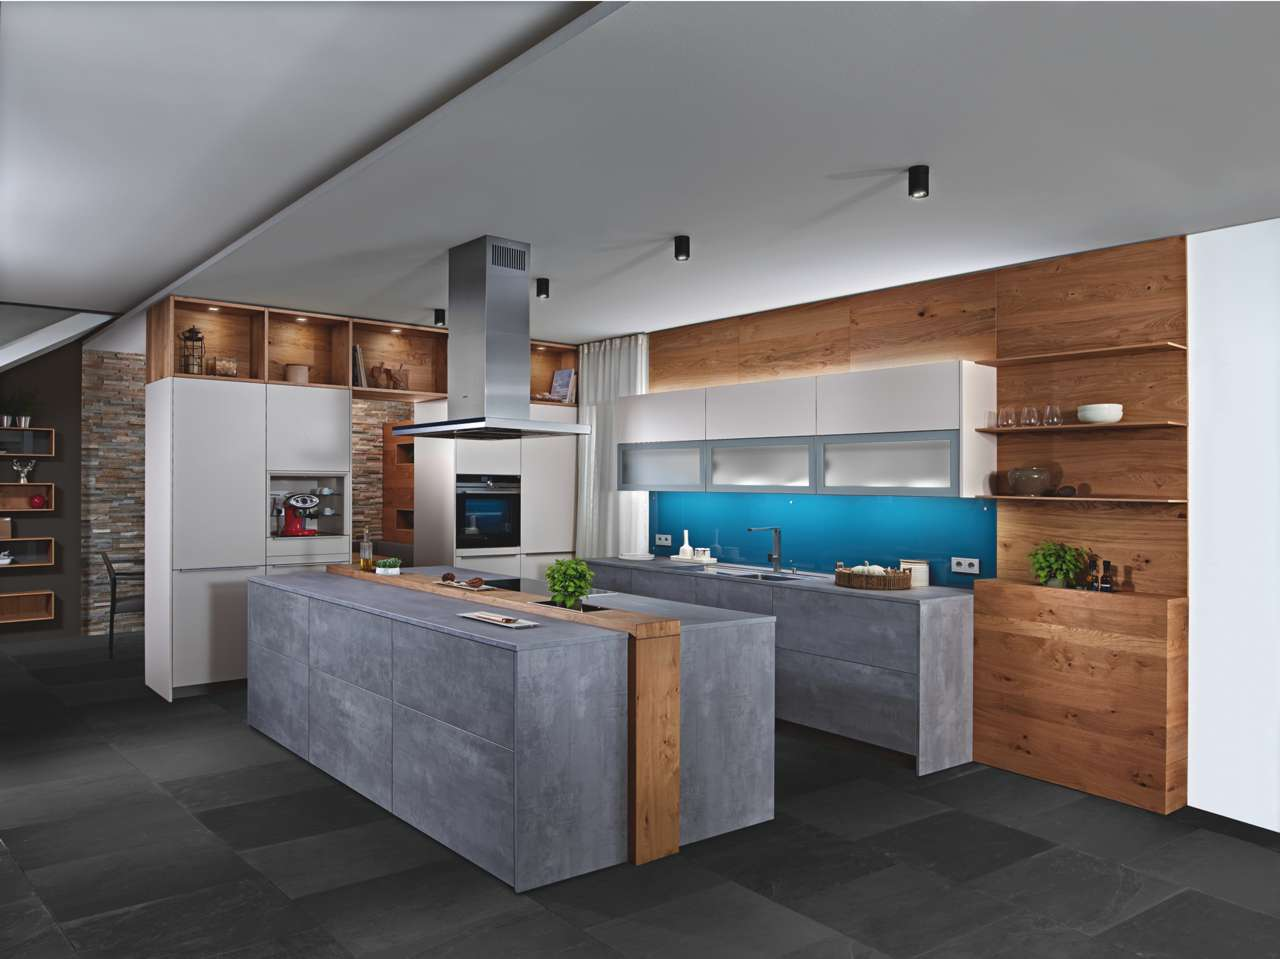 ewe-Nuova_concreto_betonoptik_küche – Küchen Journal